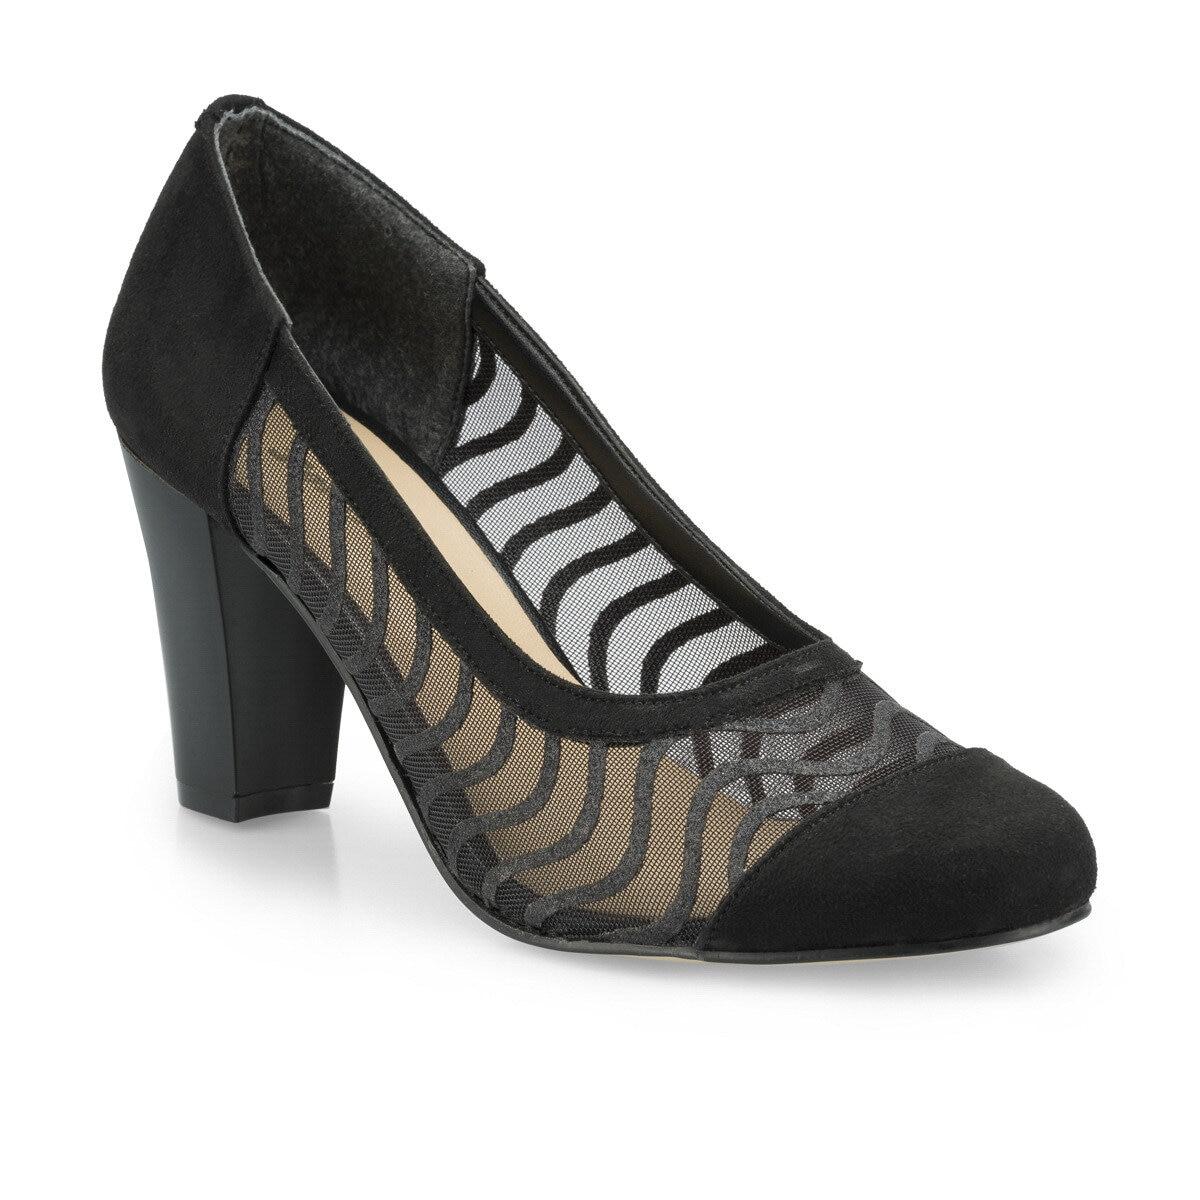 FLO Women Heeled Shoes Fashion Business Comfortable Breathable Low Heel Black Women Gova Shoes Женская обувь 315114.Z Polaris